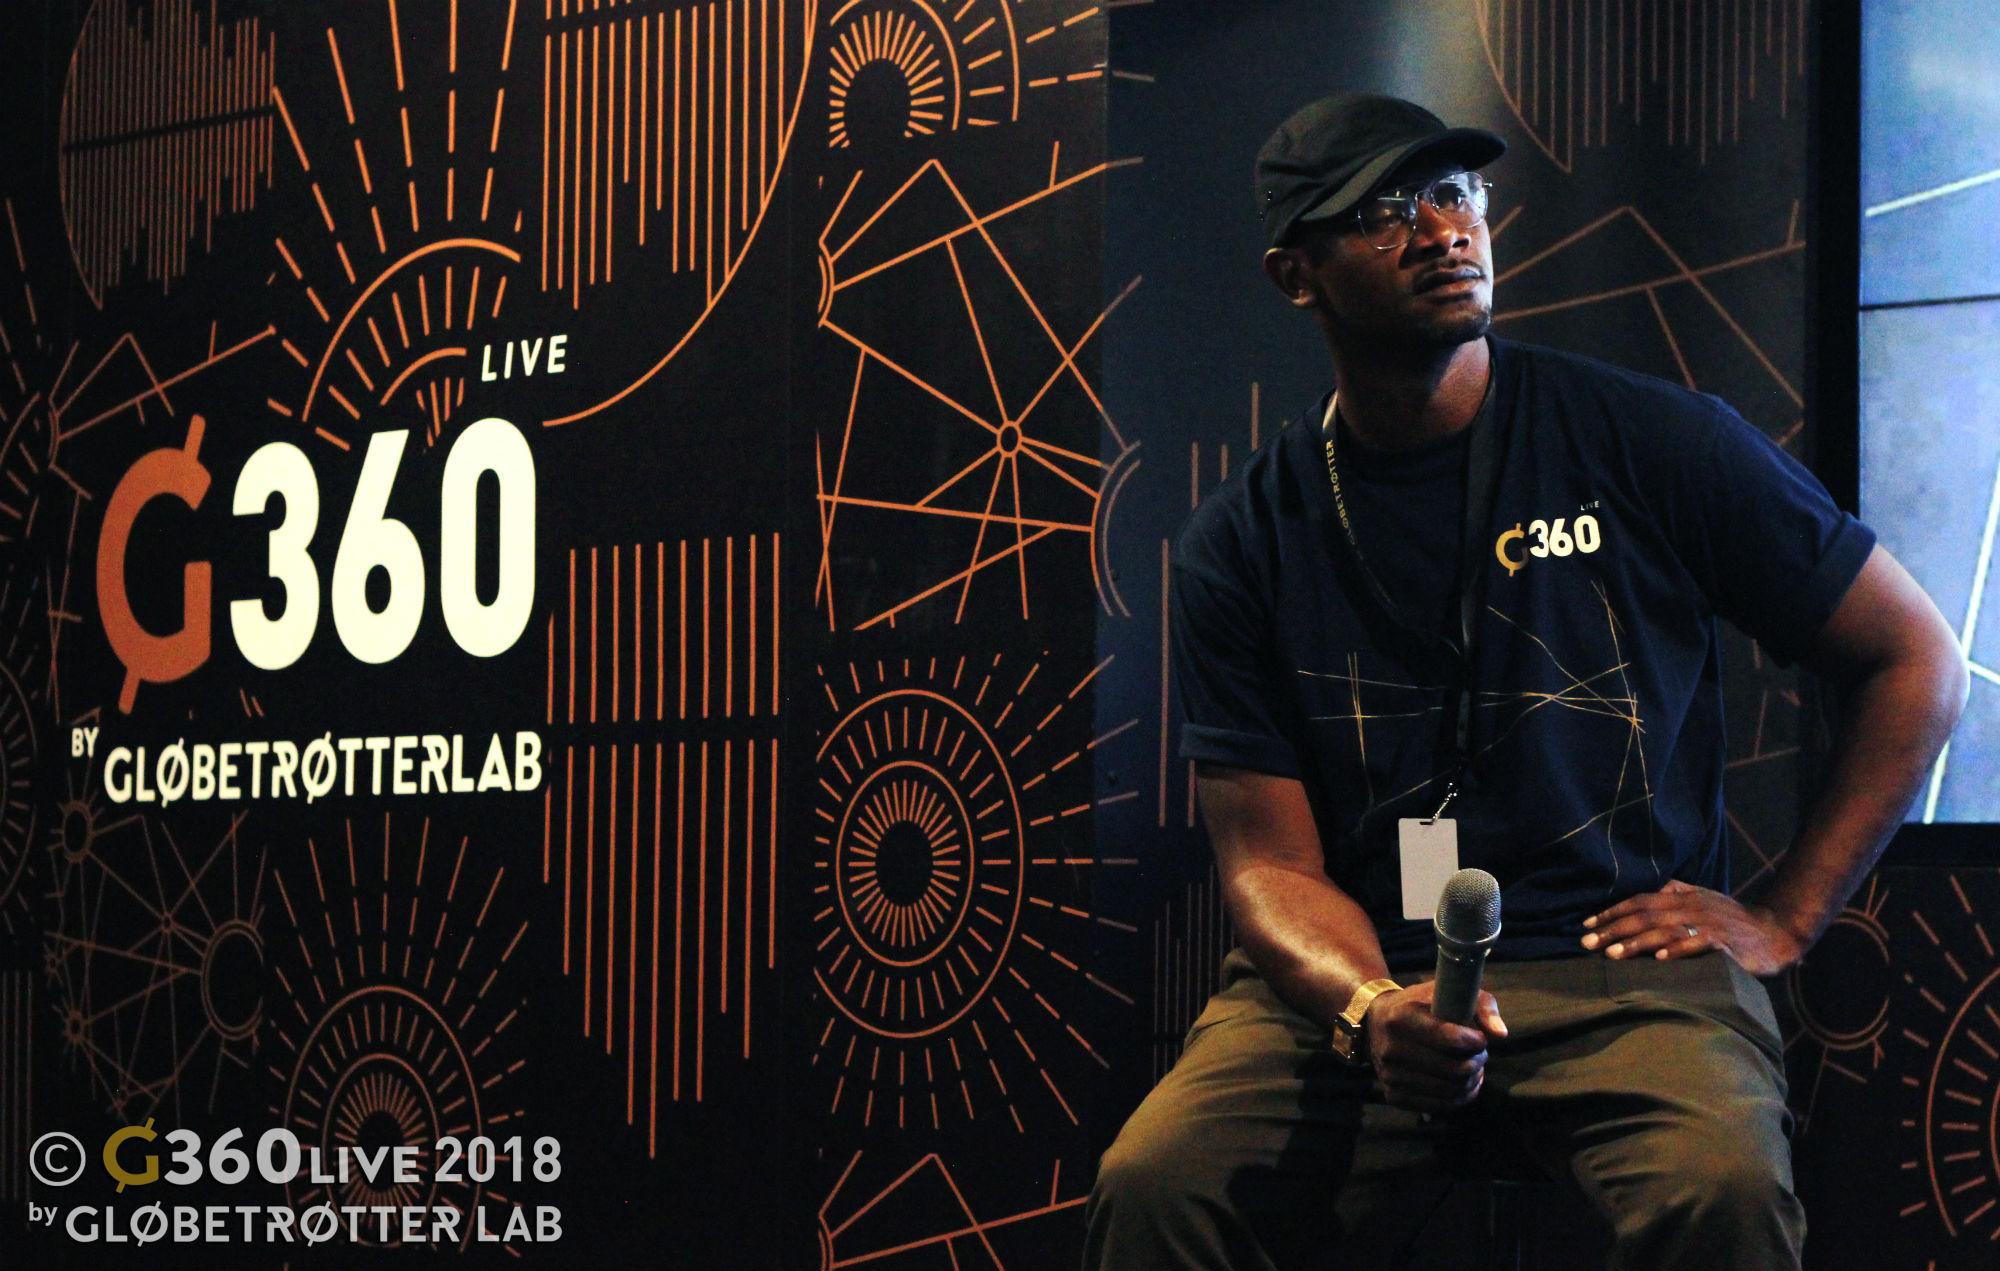 Kennedy Ashinze, Founder of Globetrotter Lab & G360 Live